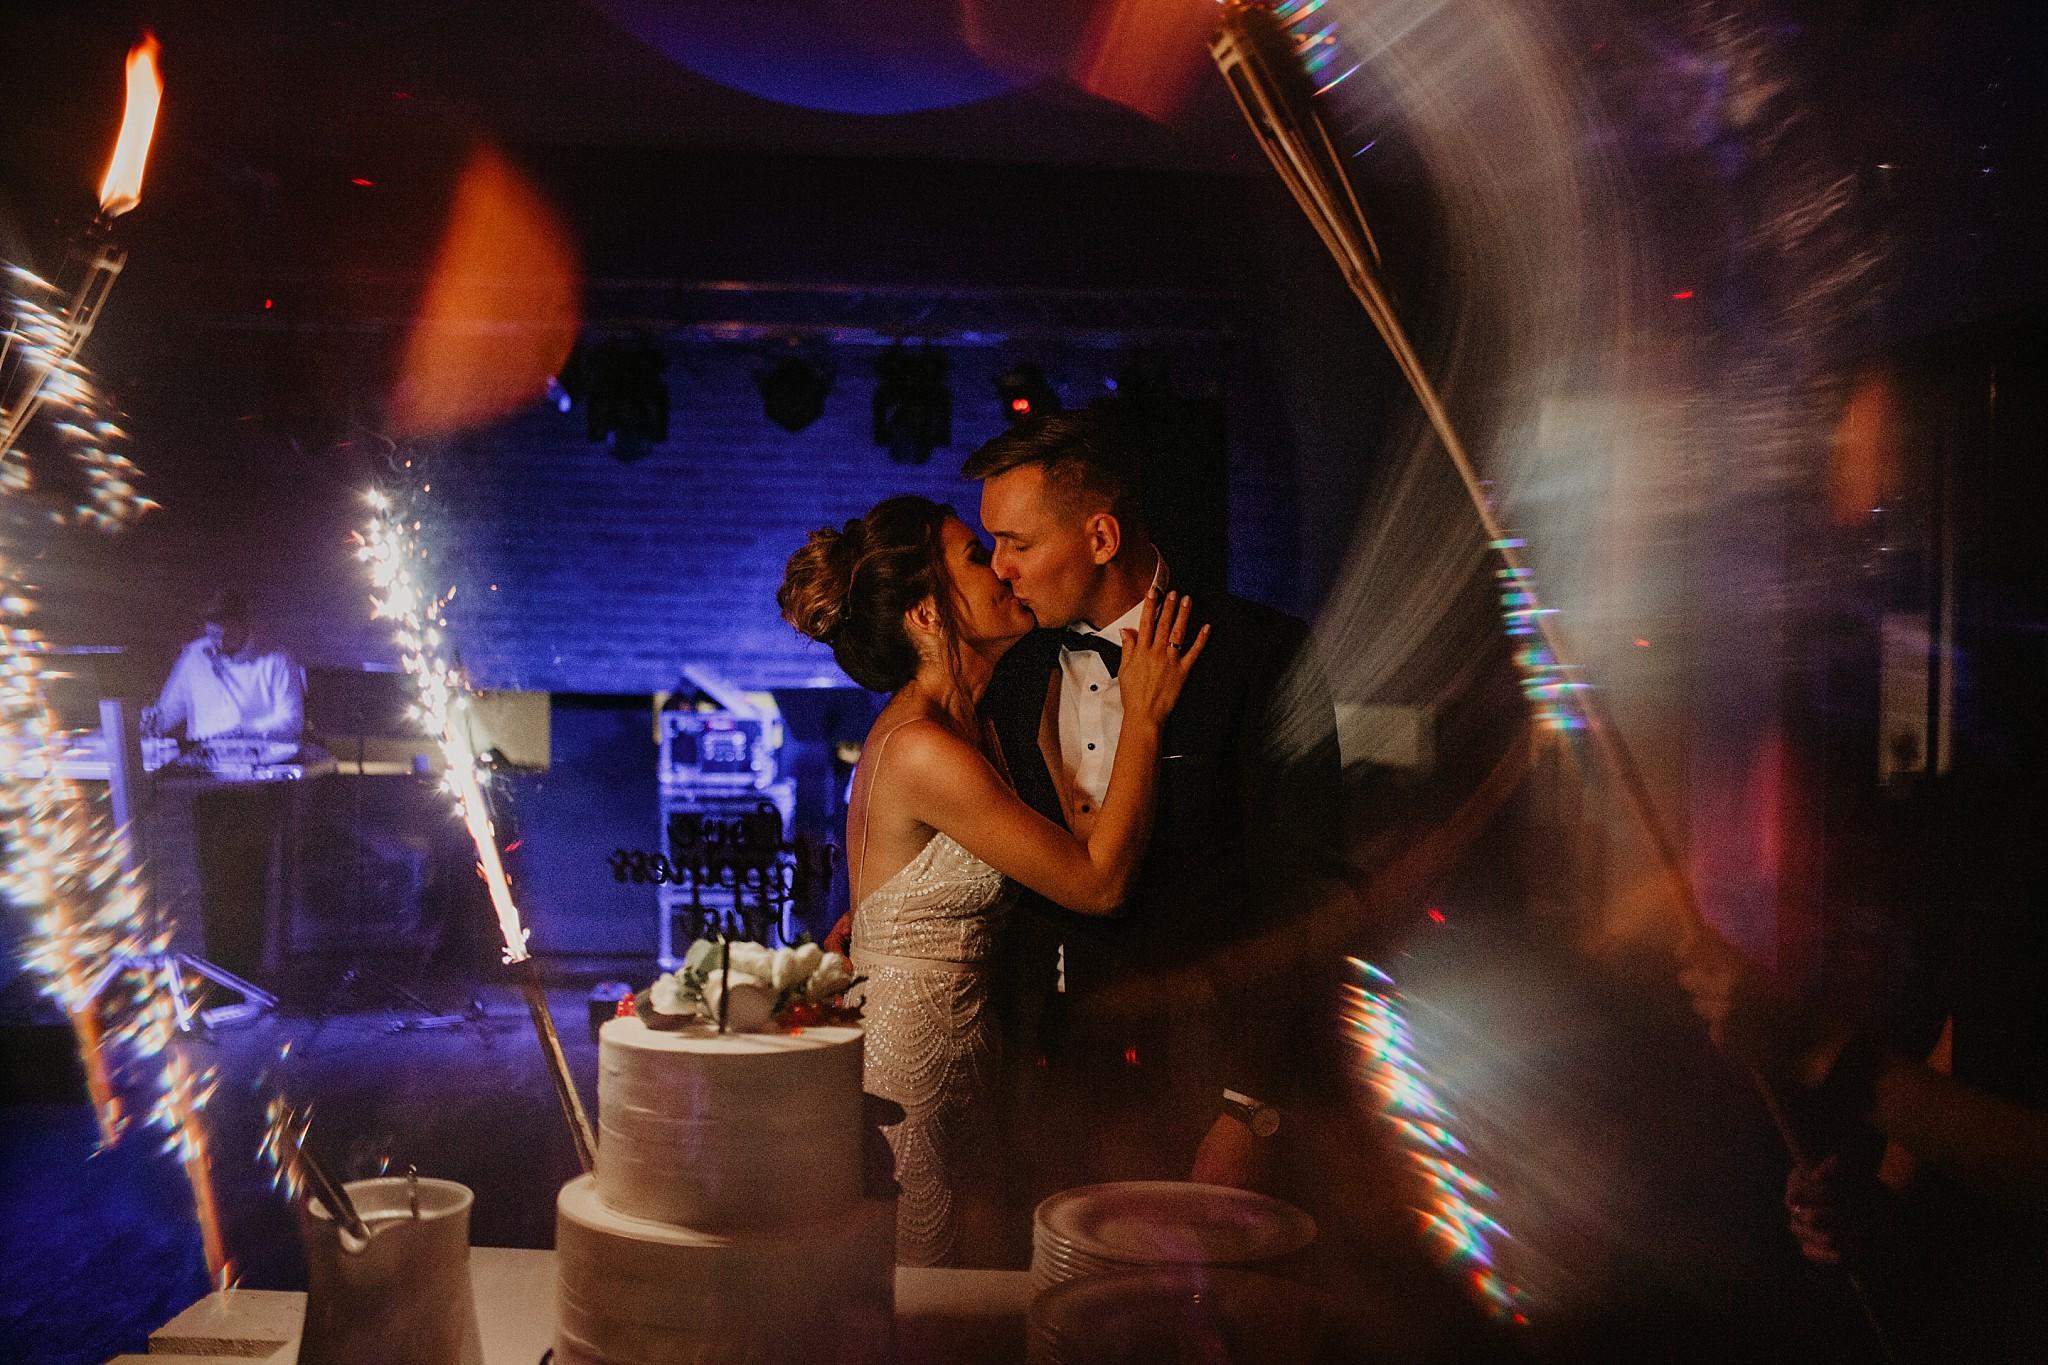 fotograf poznan wesele dobra truskawka piekne wesele pod poznaniem wesele w dobrej truskawce piekna para mloda slub marzen slub koronawirus slub listopad wesele koronawirus 497